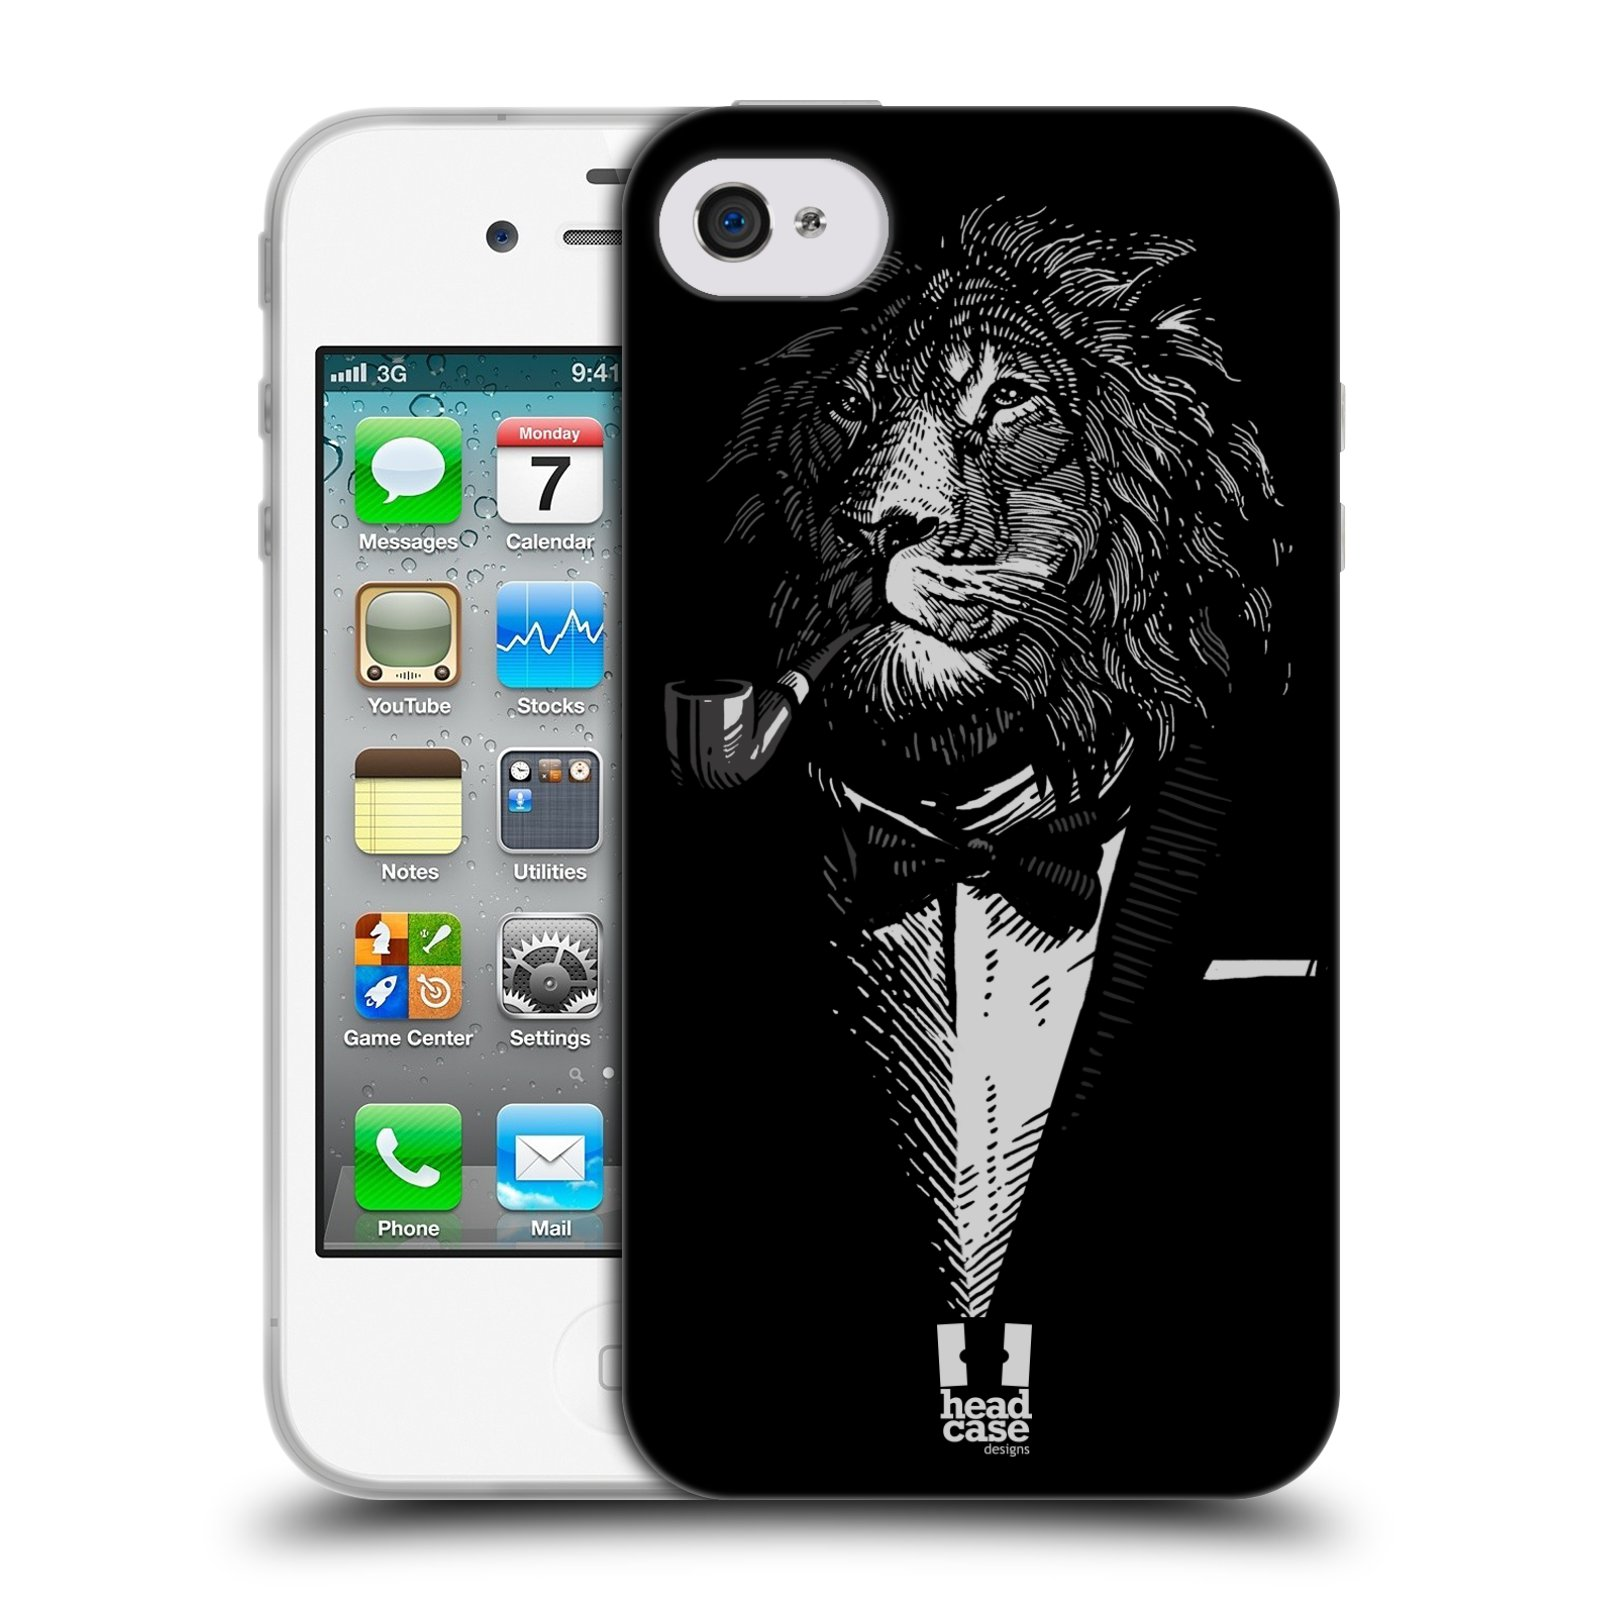 Silikonové pouzdro na mobil Apple iPhone 4 a 4S HEAD CASE LEV V KVÁDRU (Silikonový kryt či obal na mobilní telefon Apple iPhone 4 a 4S)